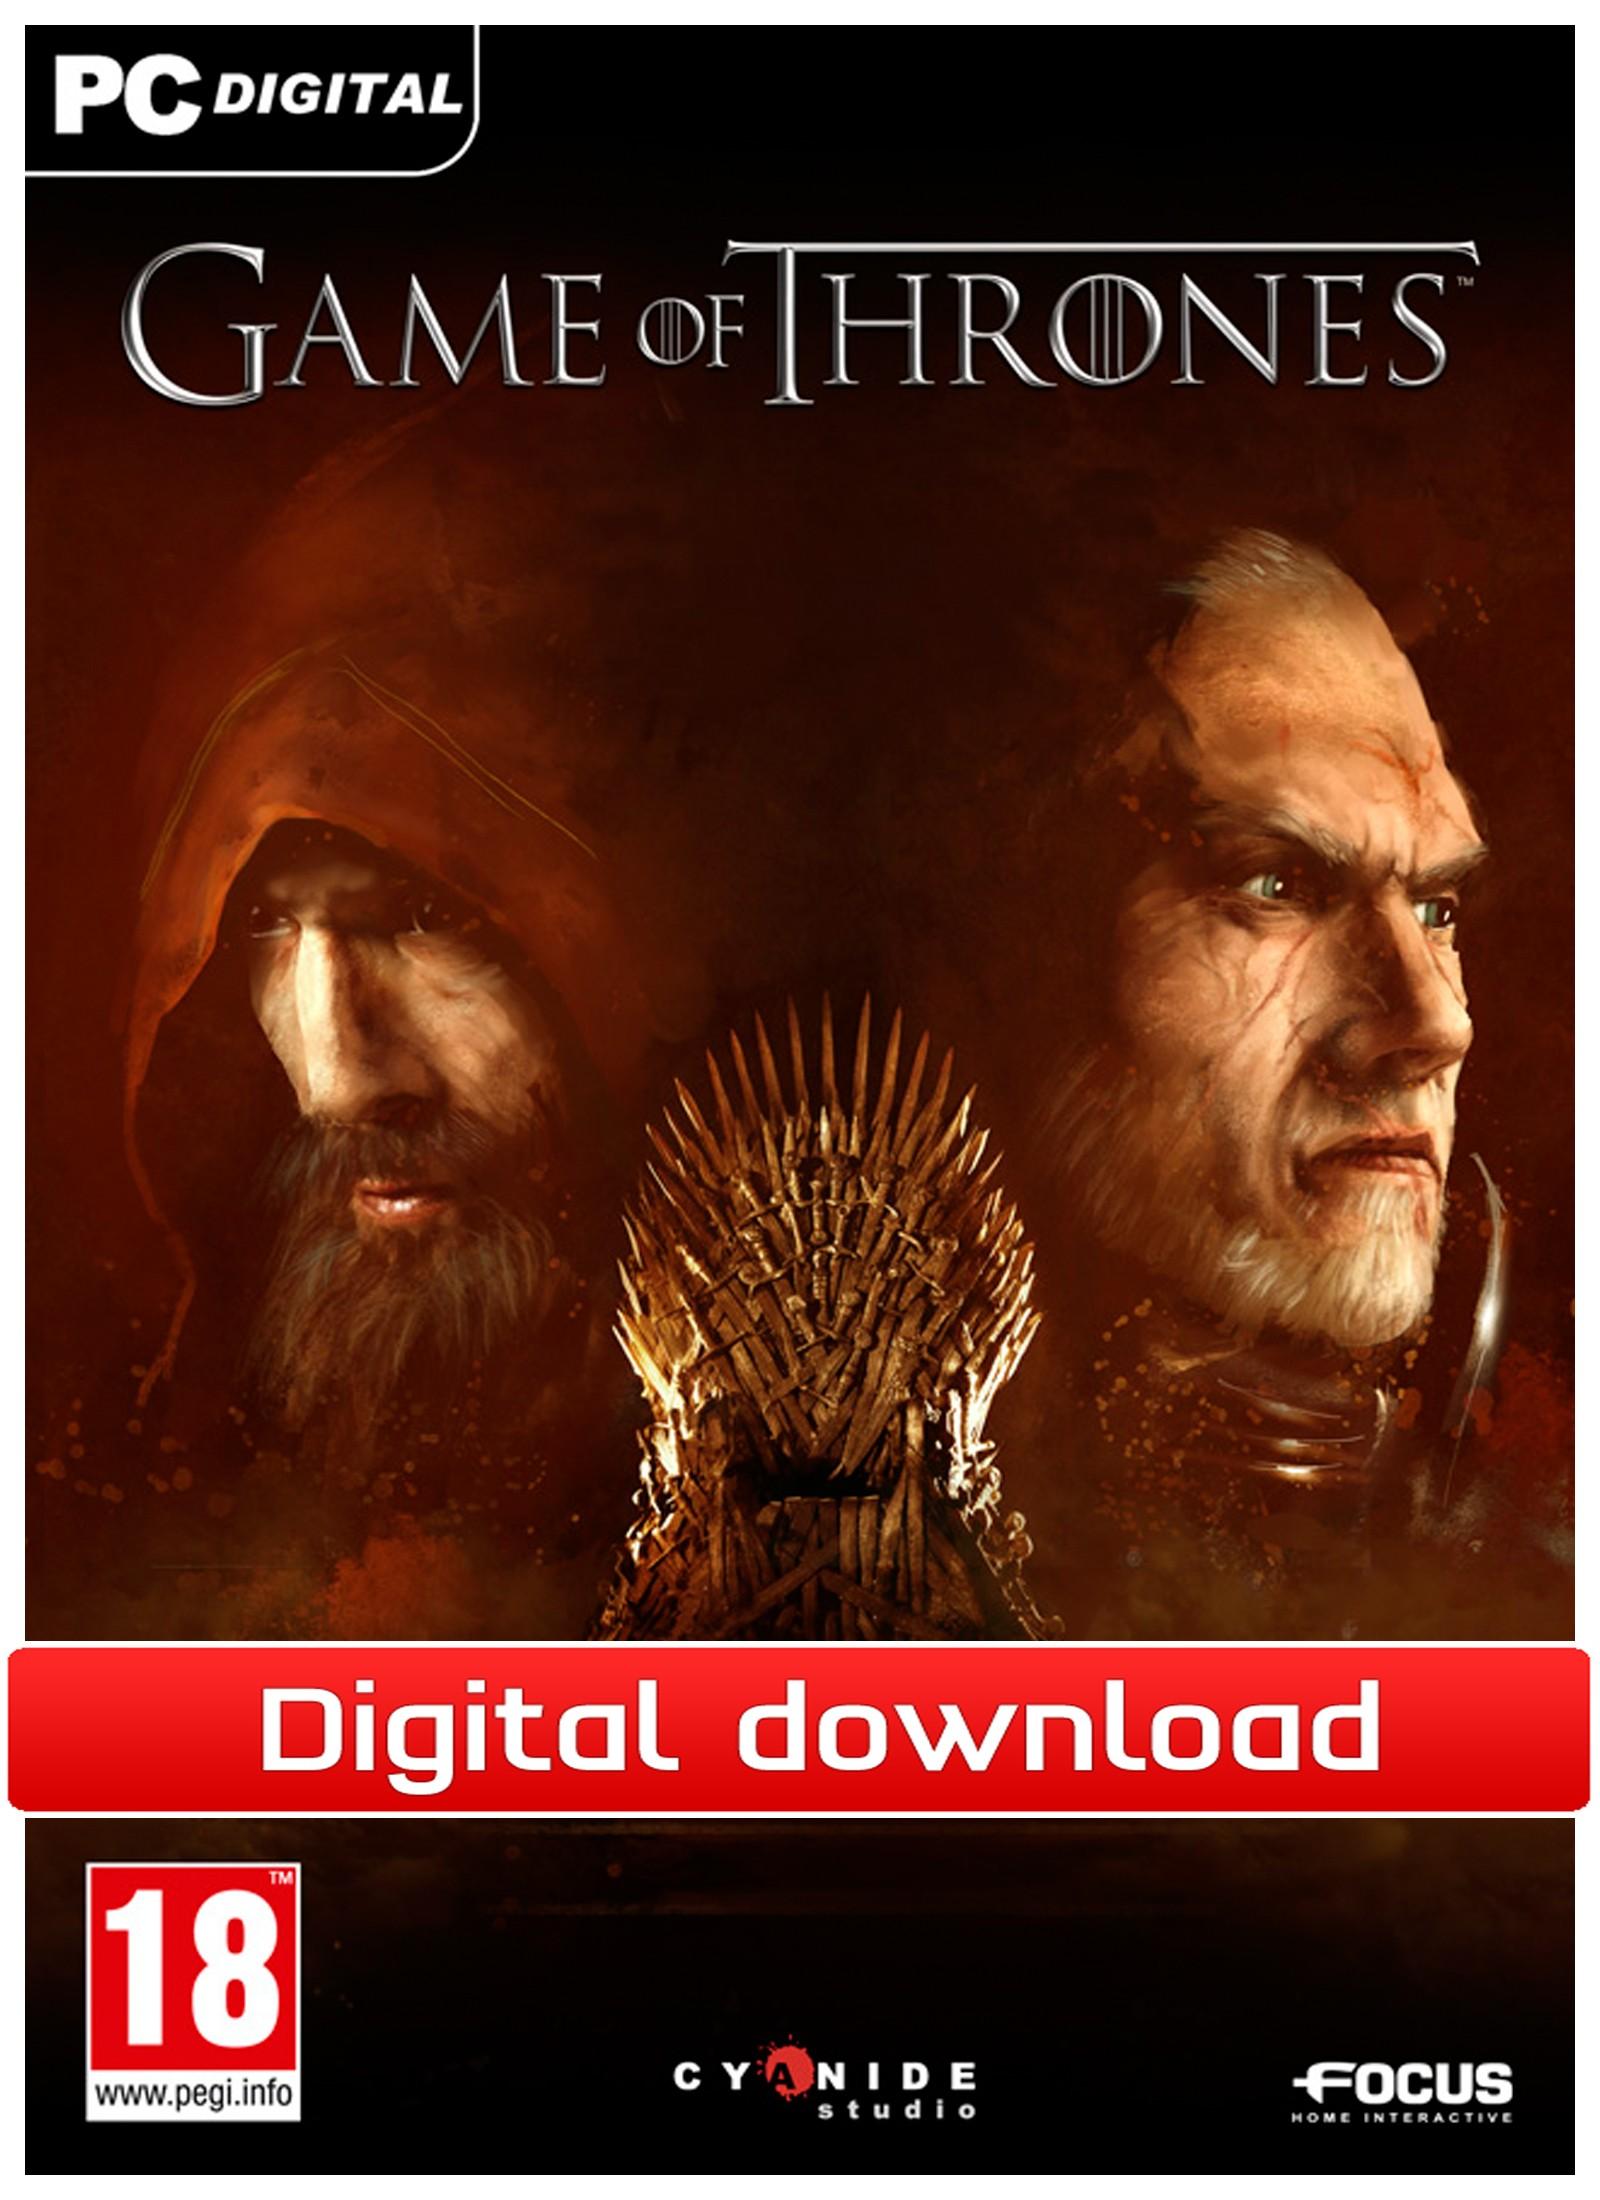 Game of Thrones - RPG (PC nedlastning) PCDD29810